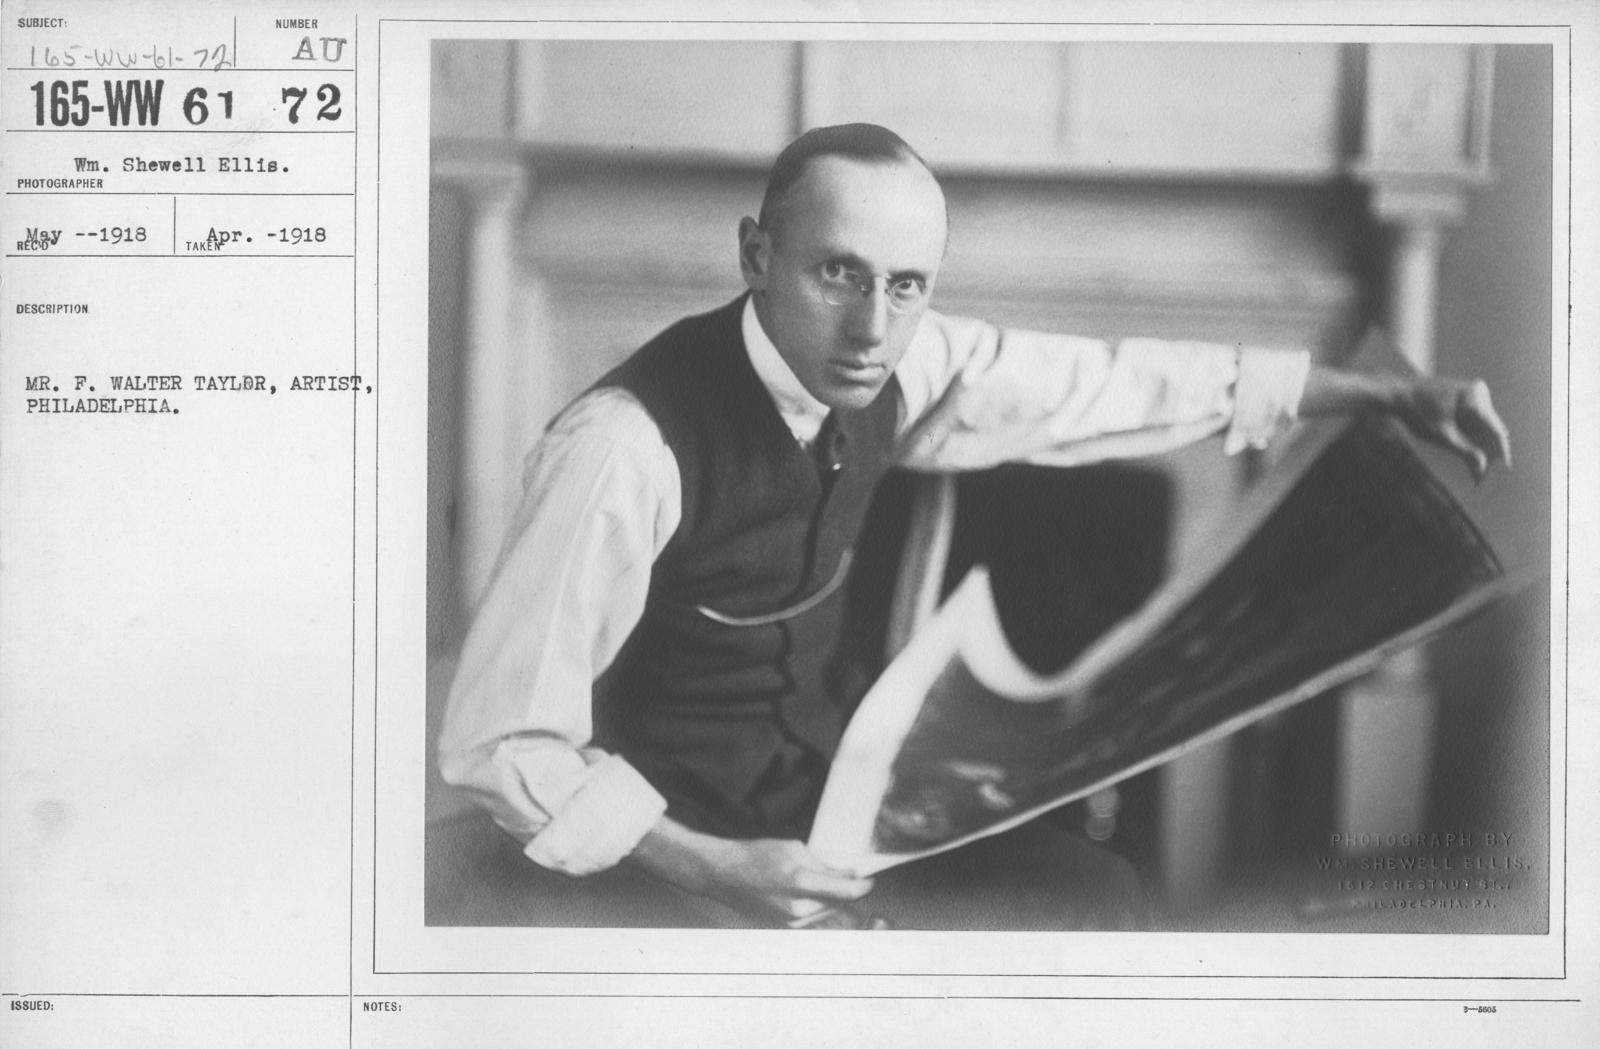 Artists - Mr. F. Walter Taylor, Artist, Philadelphia